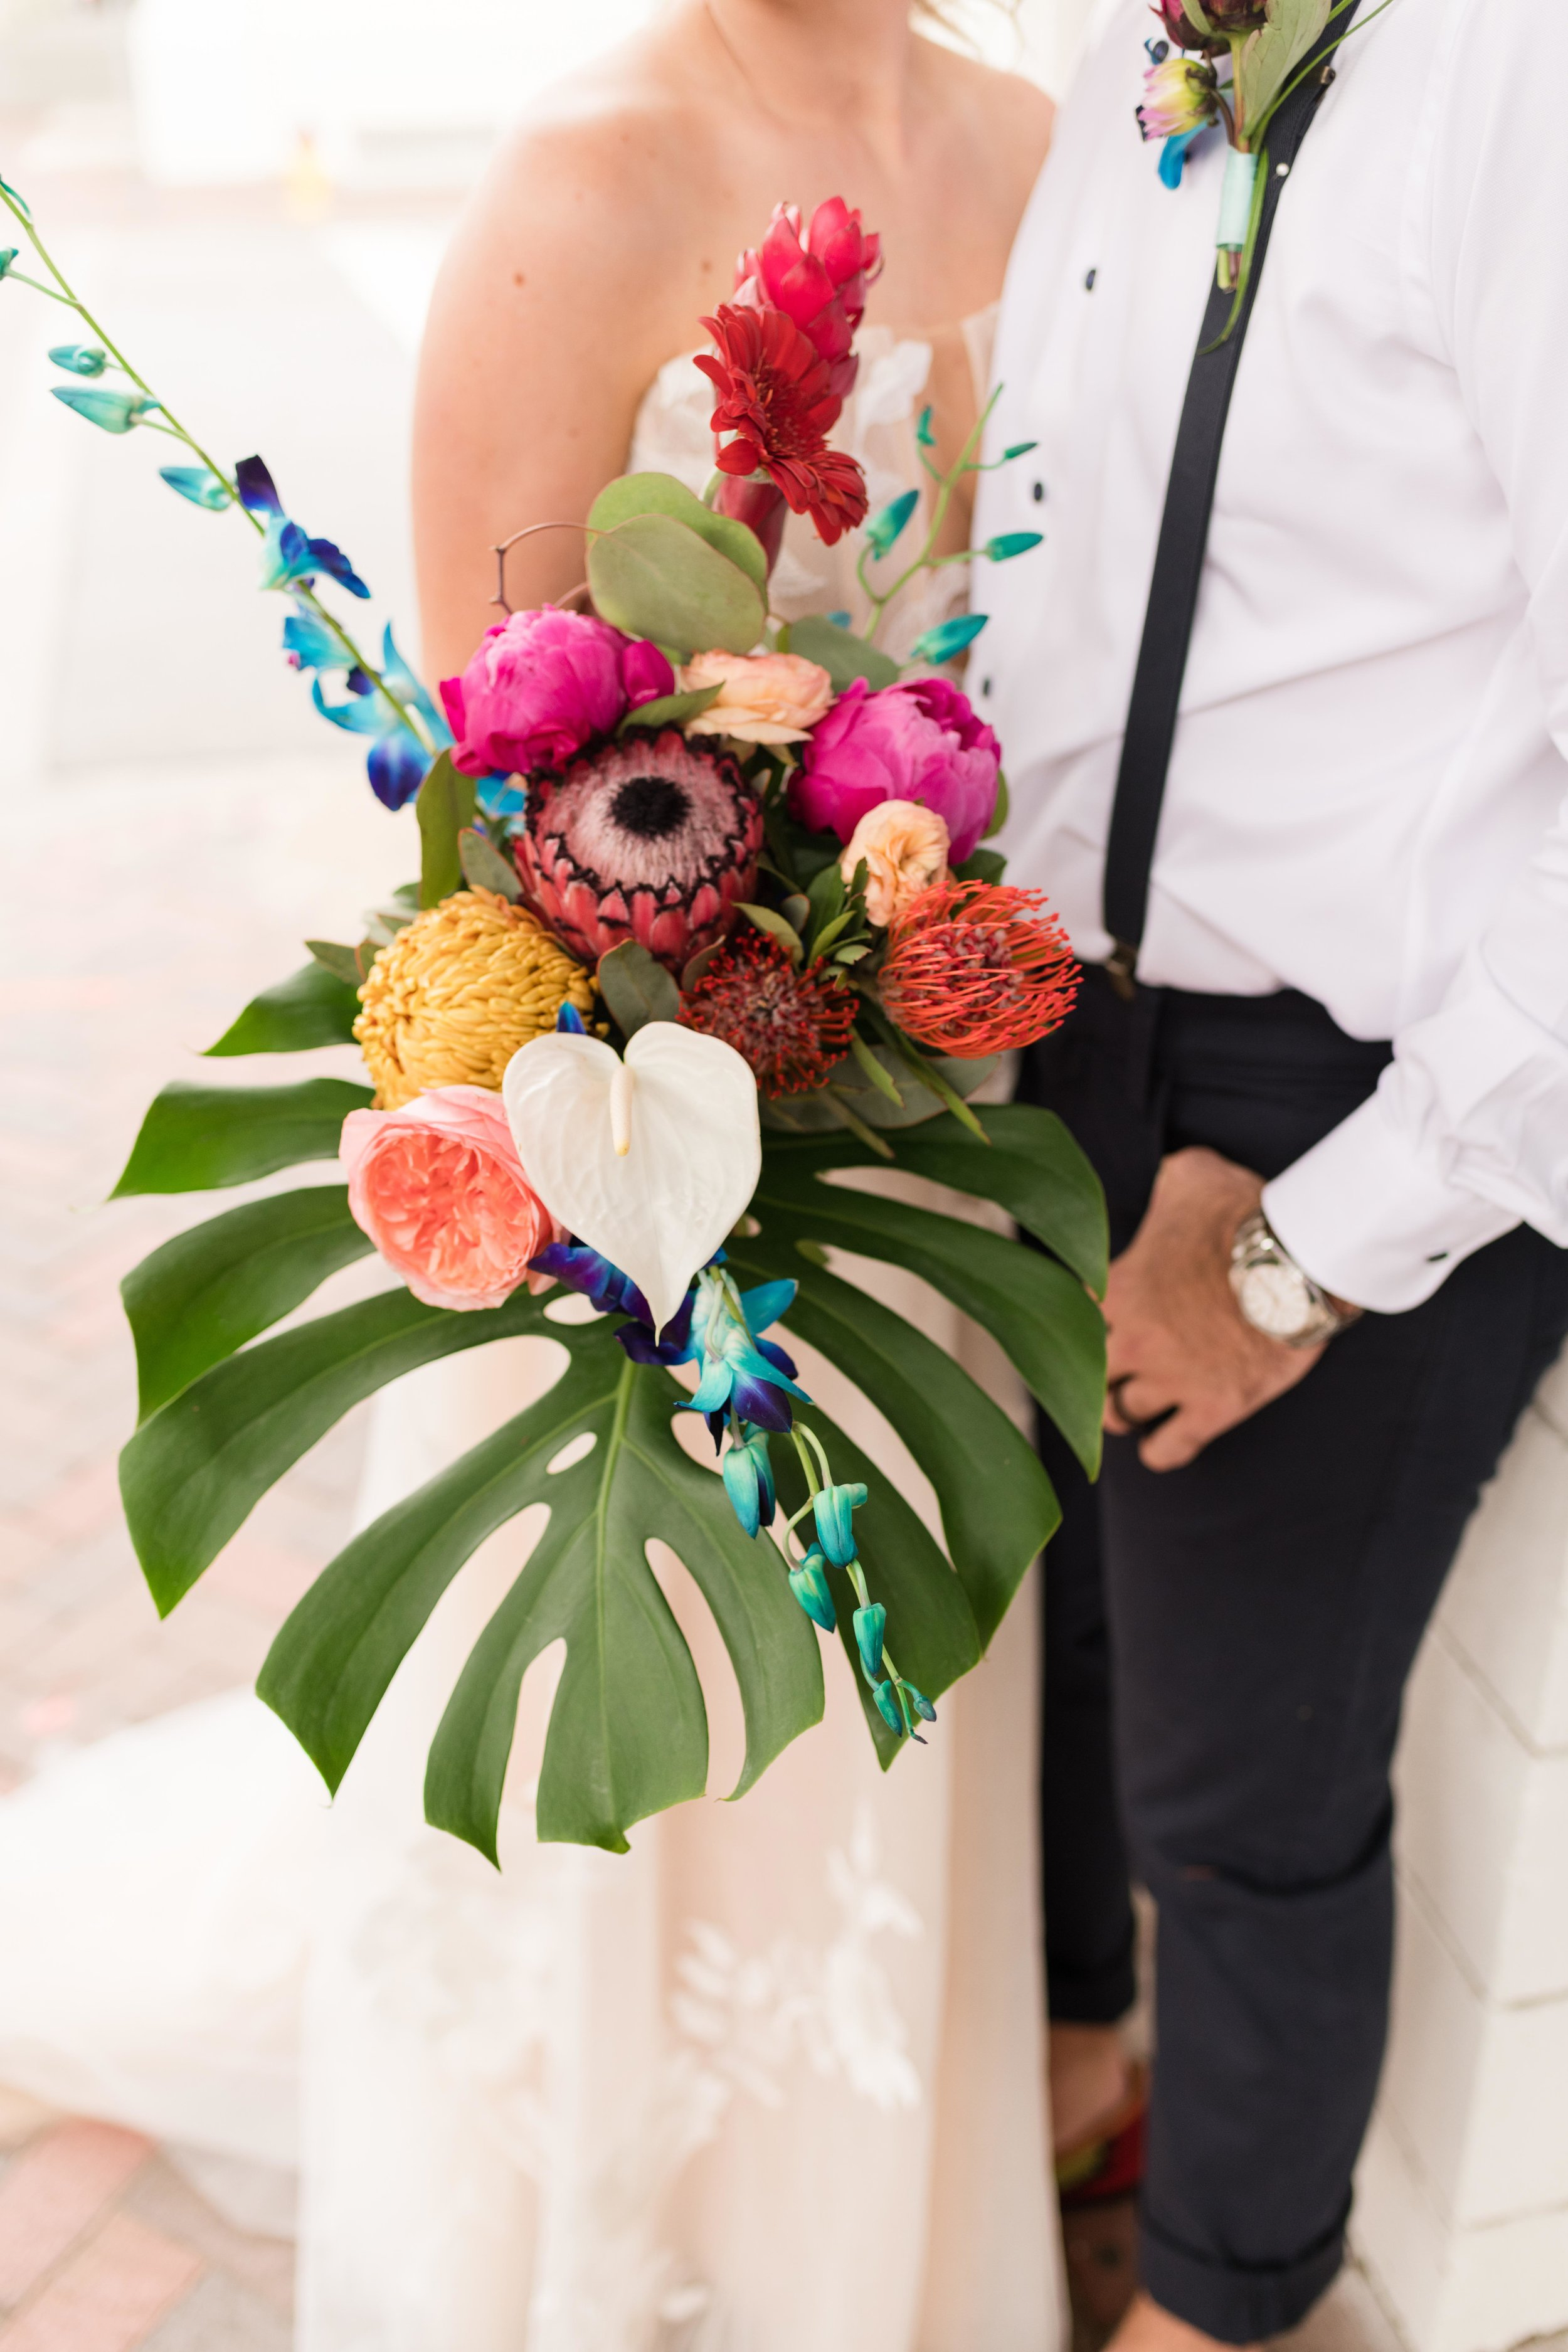 tropical-wedding-bouquet-blue-orchids-protea-bouquet-tropical-wedding-inspiration-tropical-wedding-flowers-monstera-leaf-bouquet-savannah-wedding-florist-ivory-and-beau-savannah-carnaval-wedding-florist-the-clyde-wedding-venues.jpg